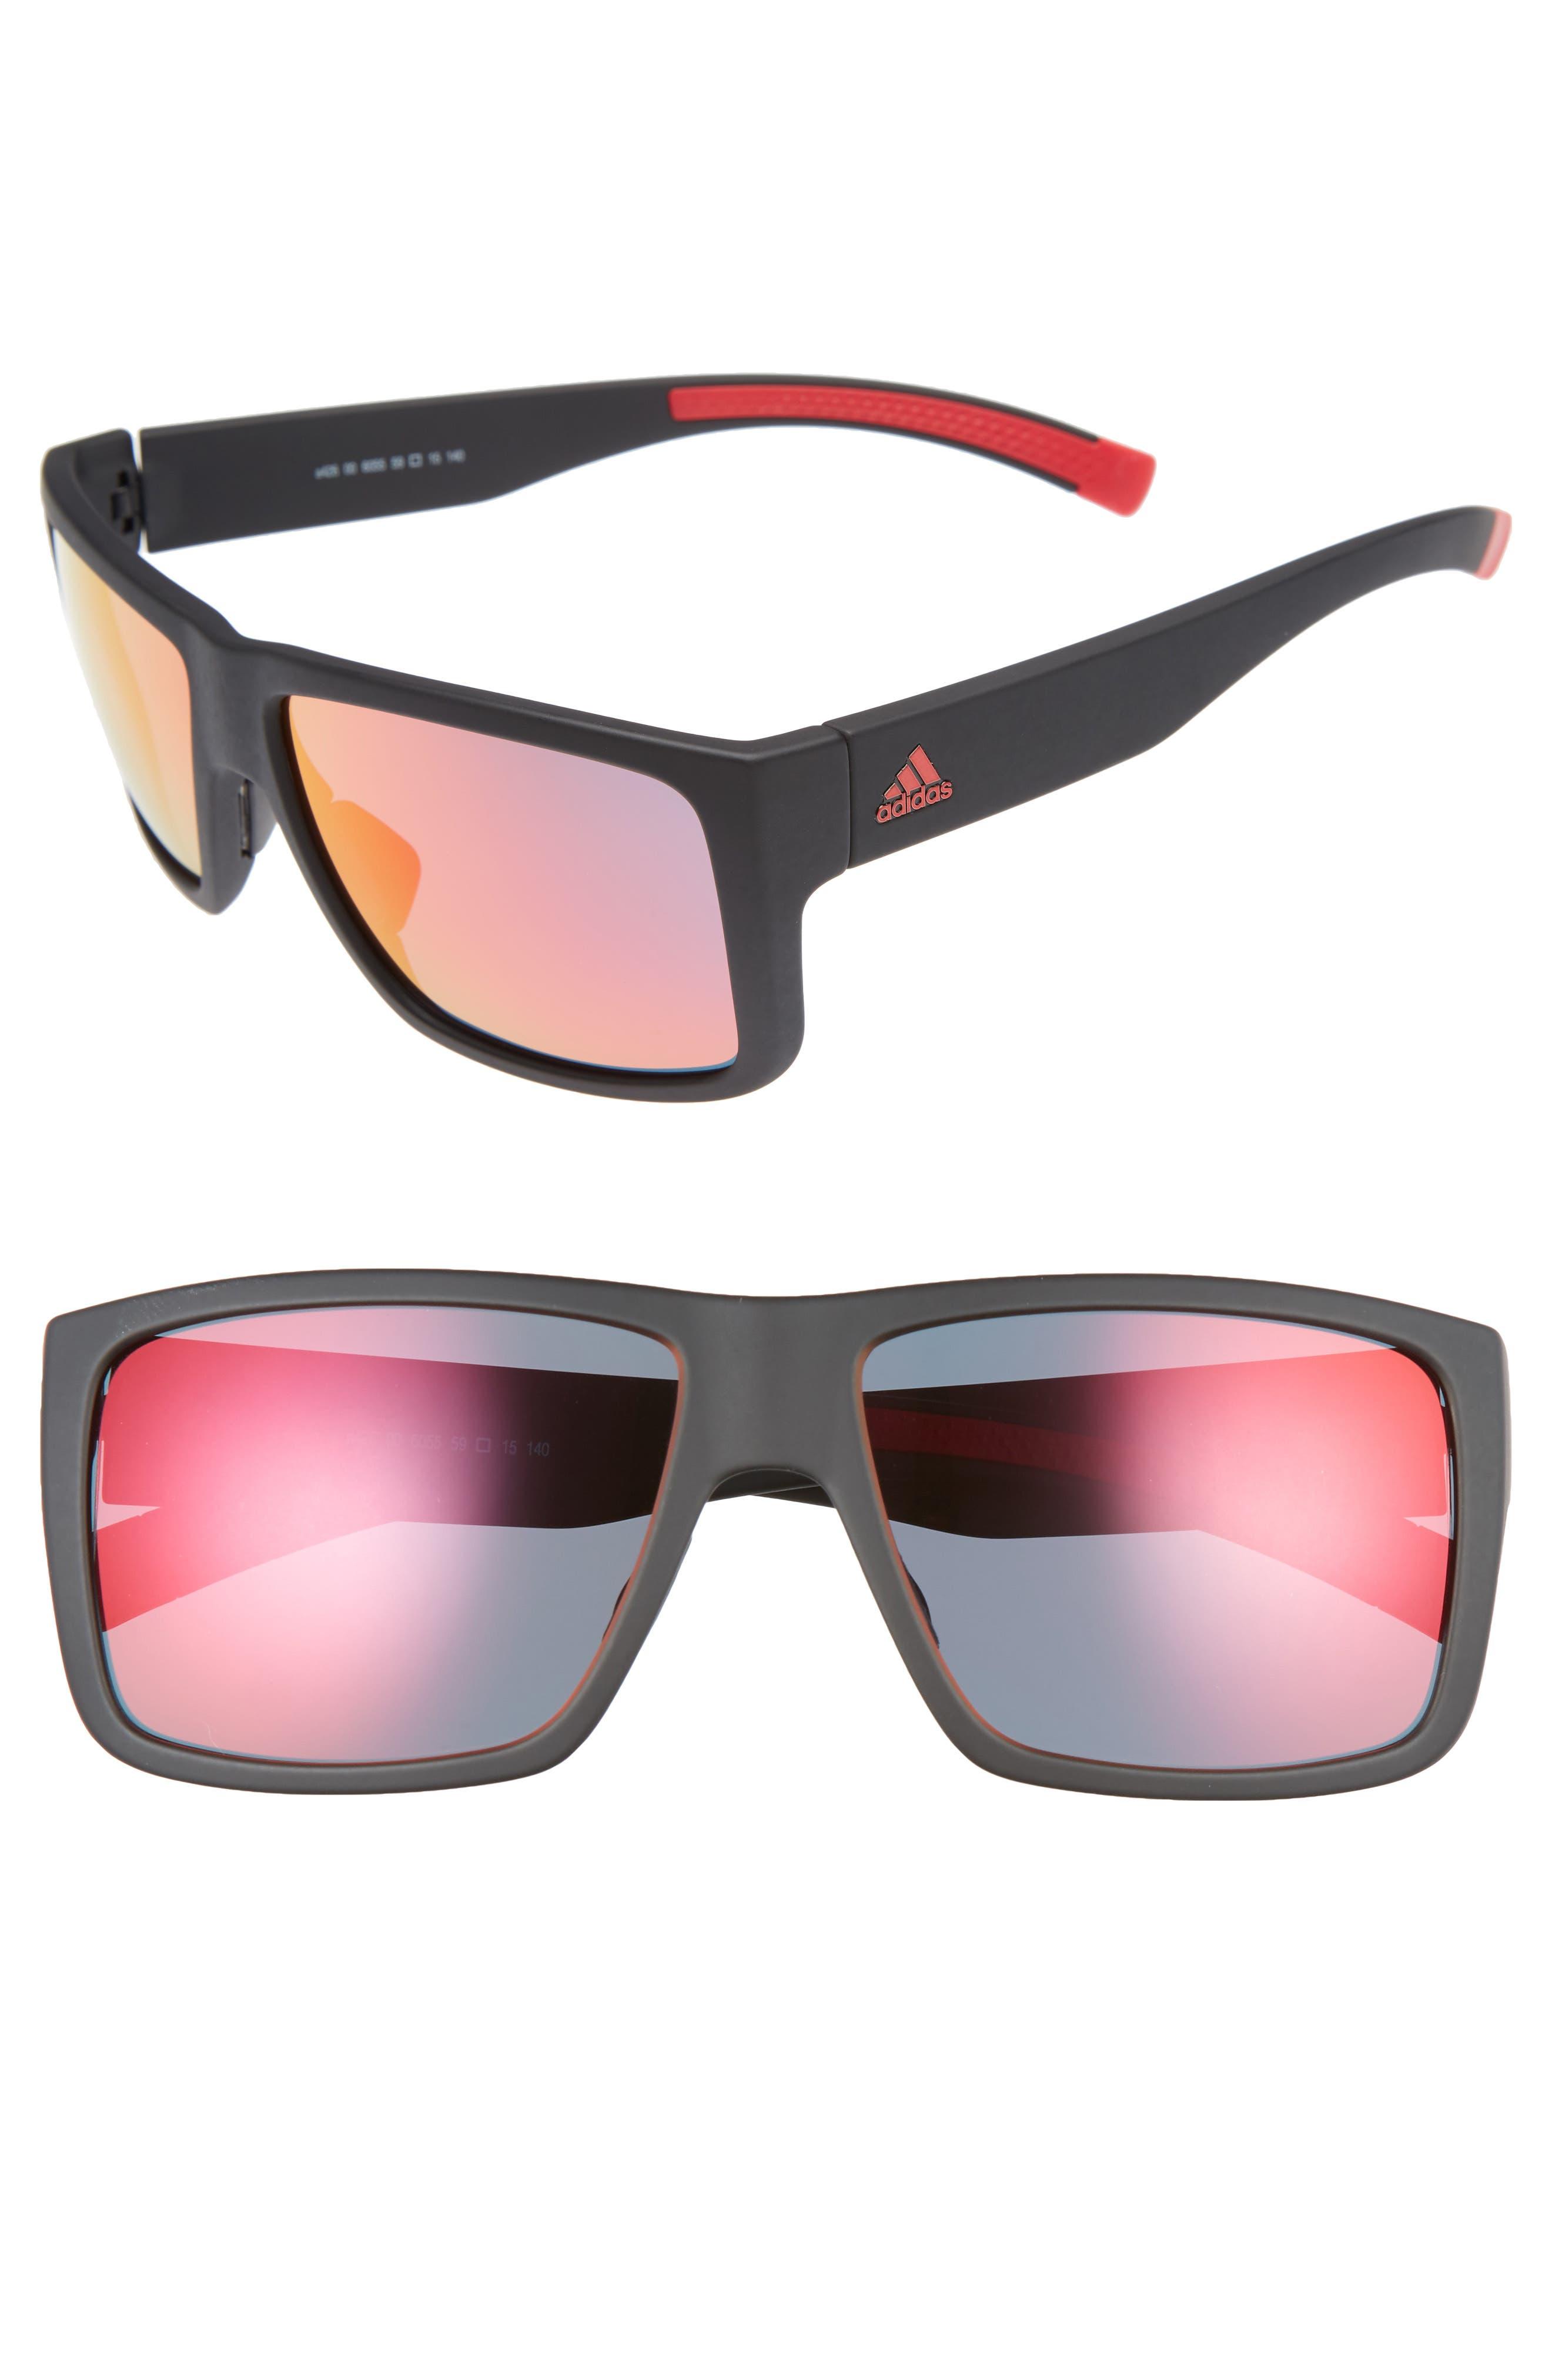 Matic 59mm Sunglasses,                         Main,                         color, BLACK MATTE/ RED MIRROR